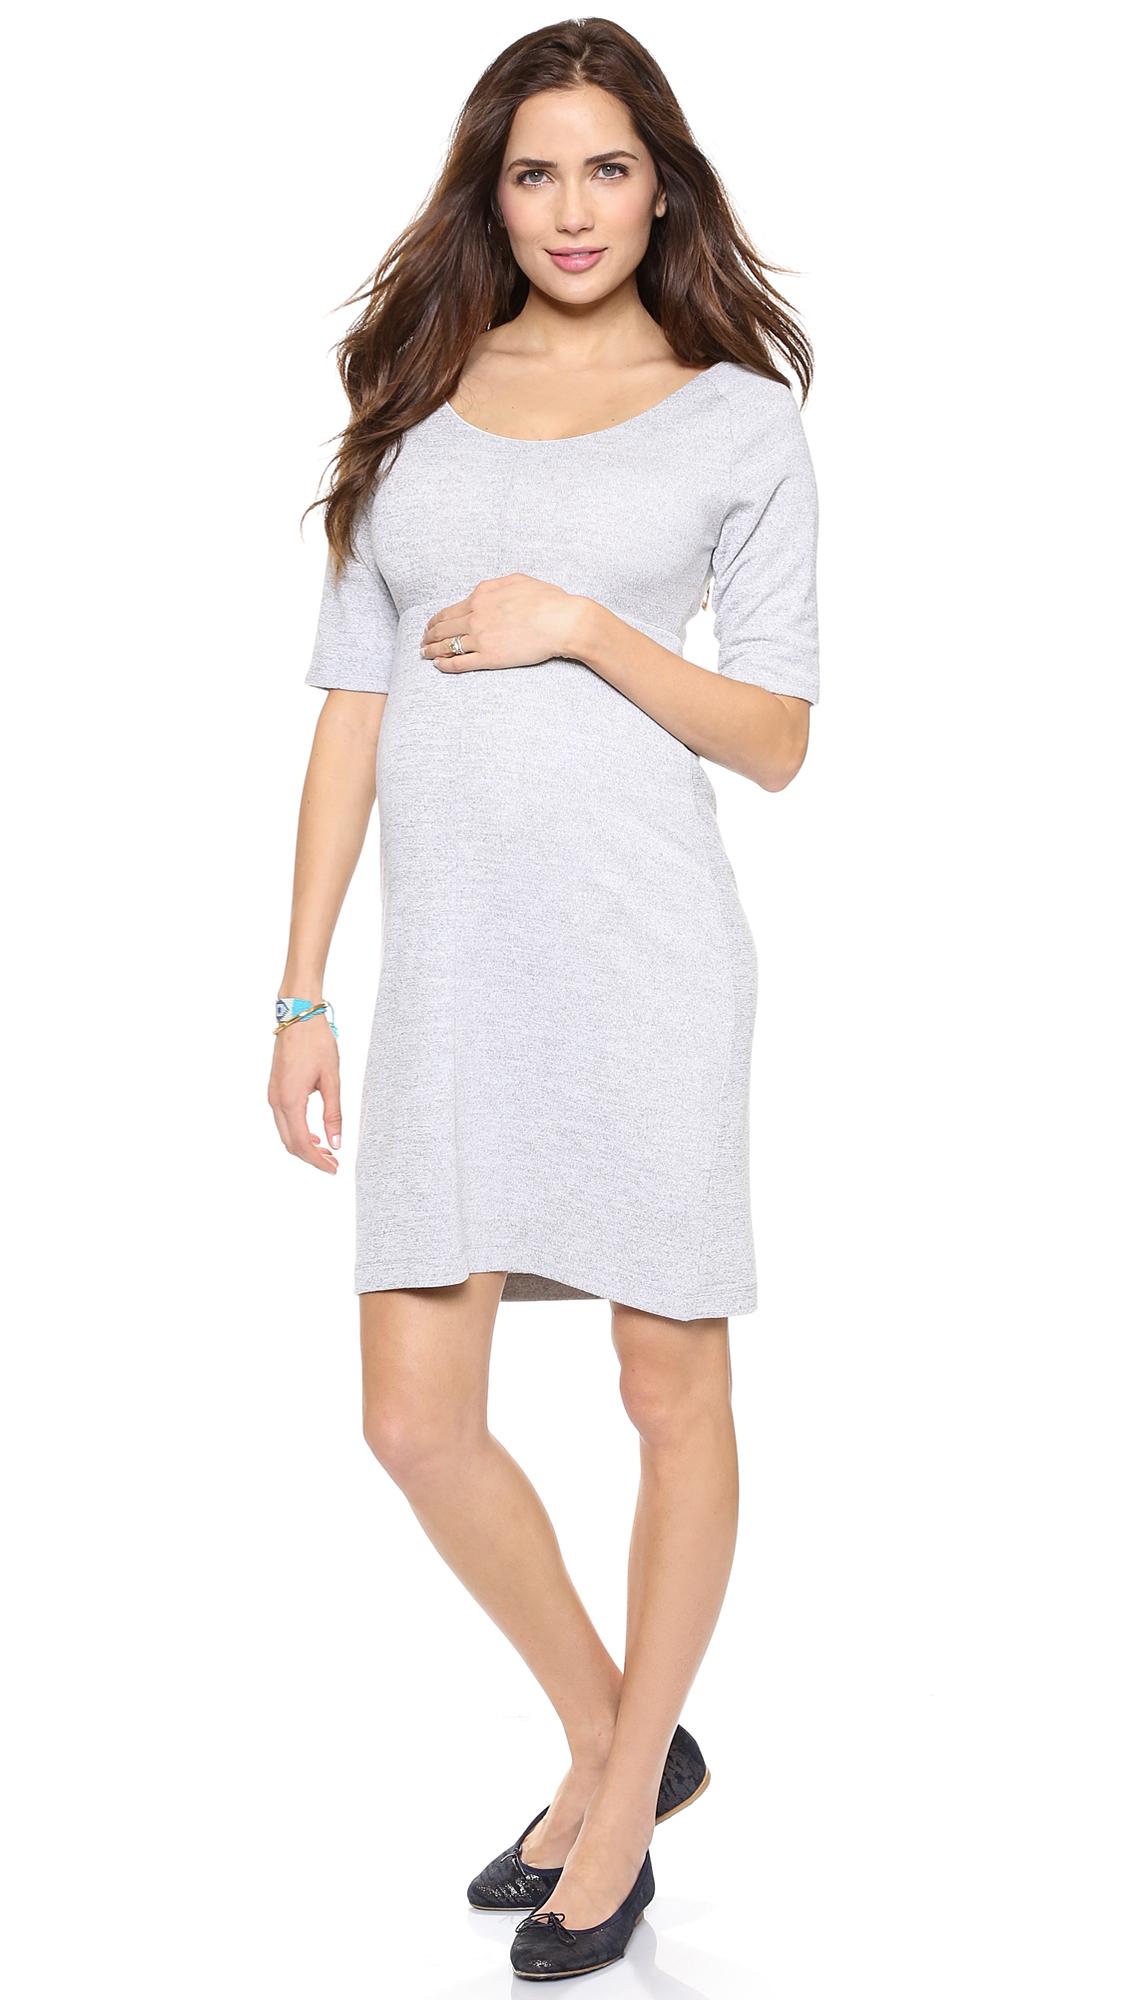 Rosie pope space dye maternity dress heather grey in gray lyst gallery ombrellifo Gallery